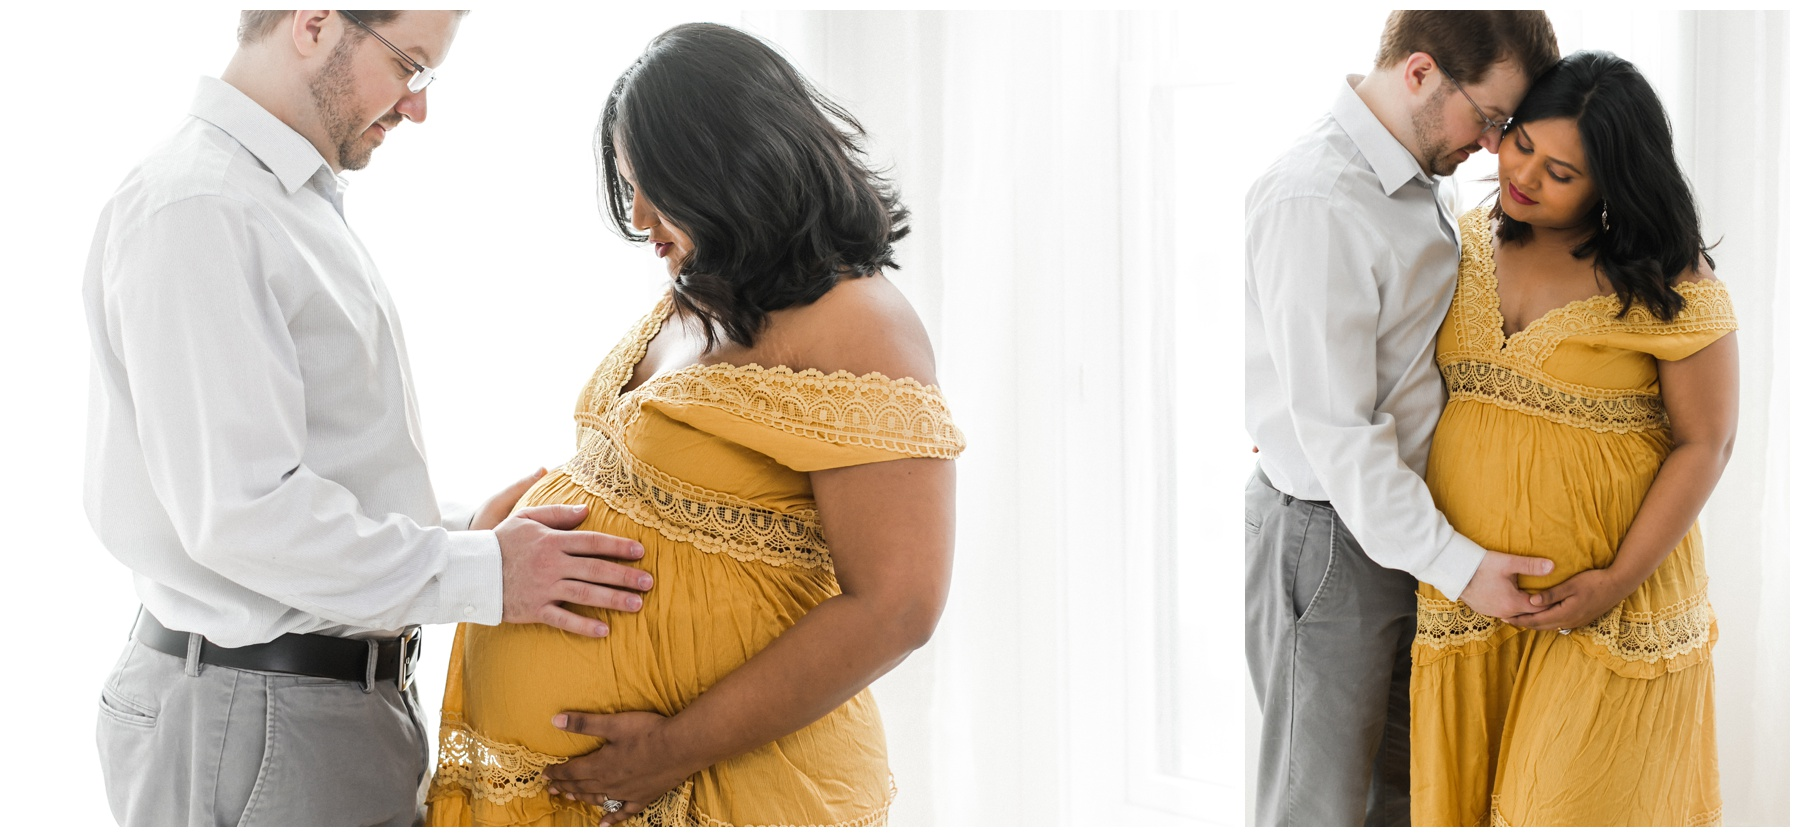 chicago-lifestyle-maternity-pregnancy-photographer-jenny-grimm-photography_0001.jpg